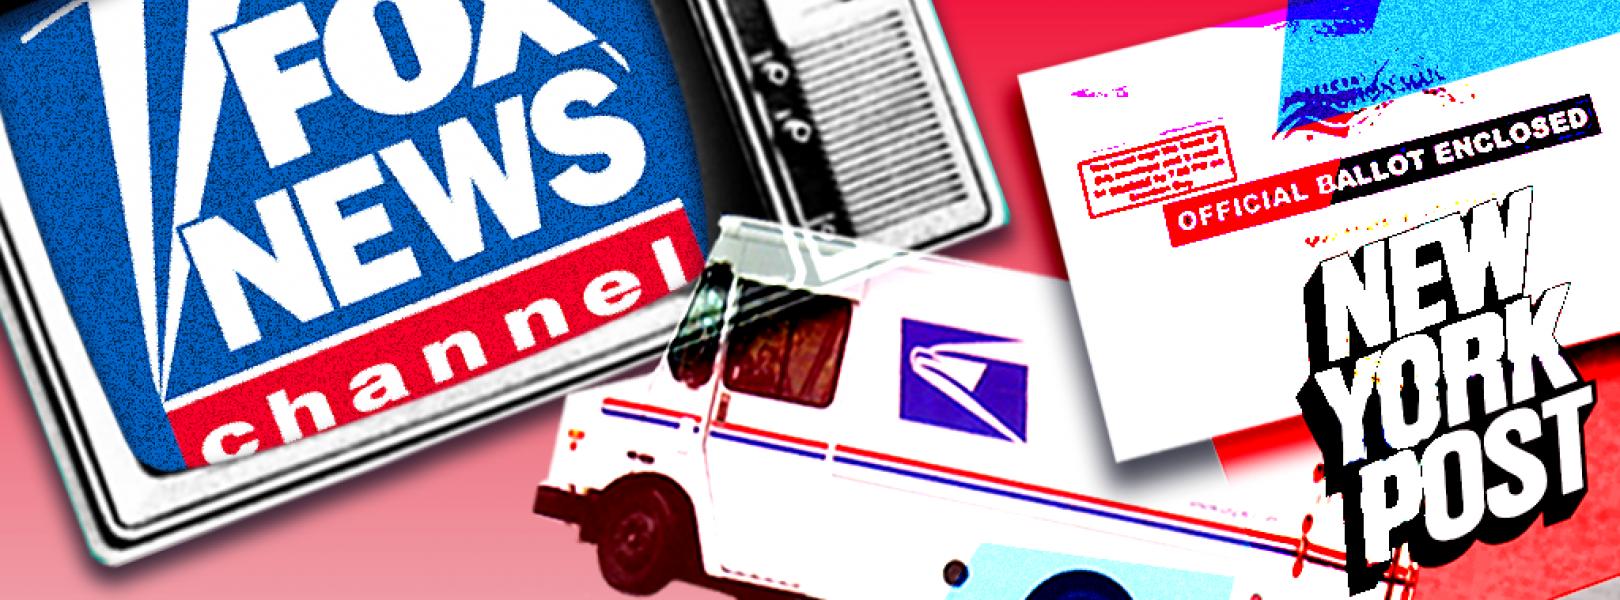 NY Post voter fraud